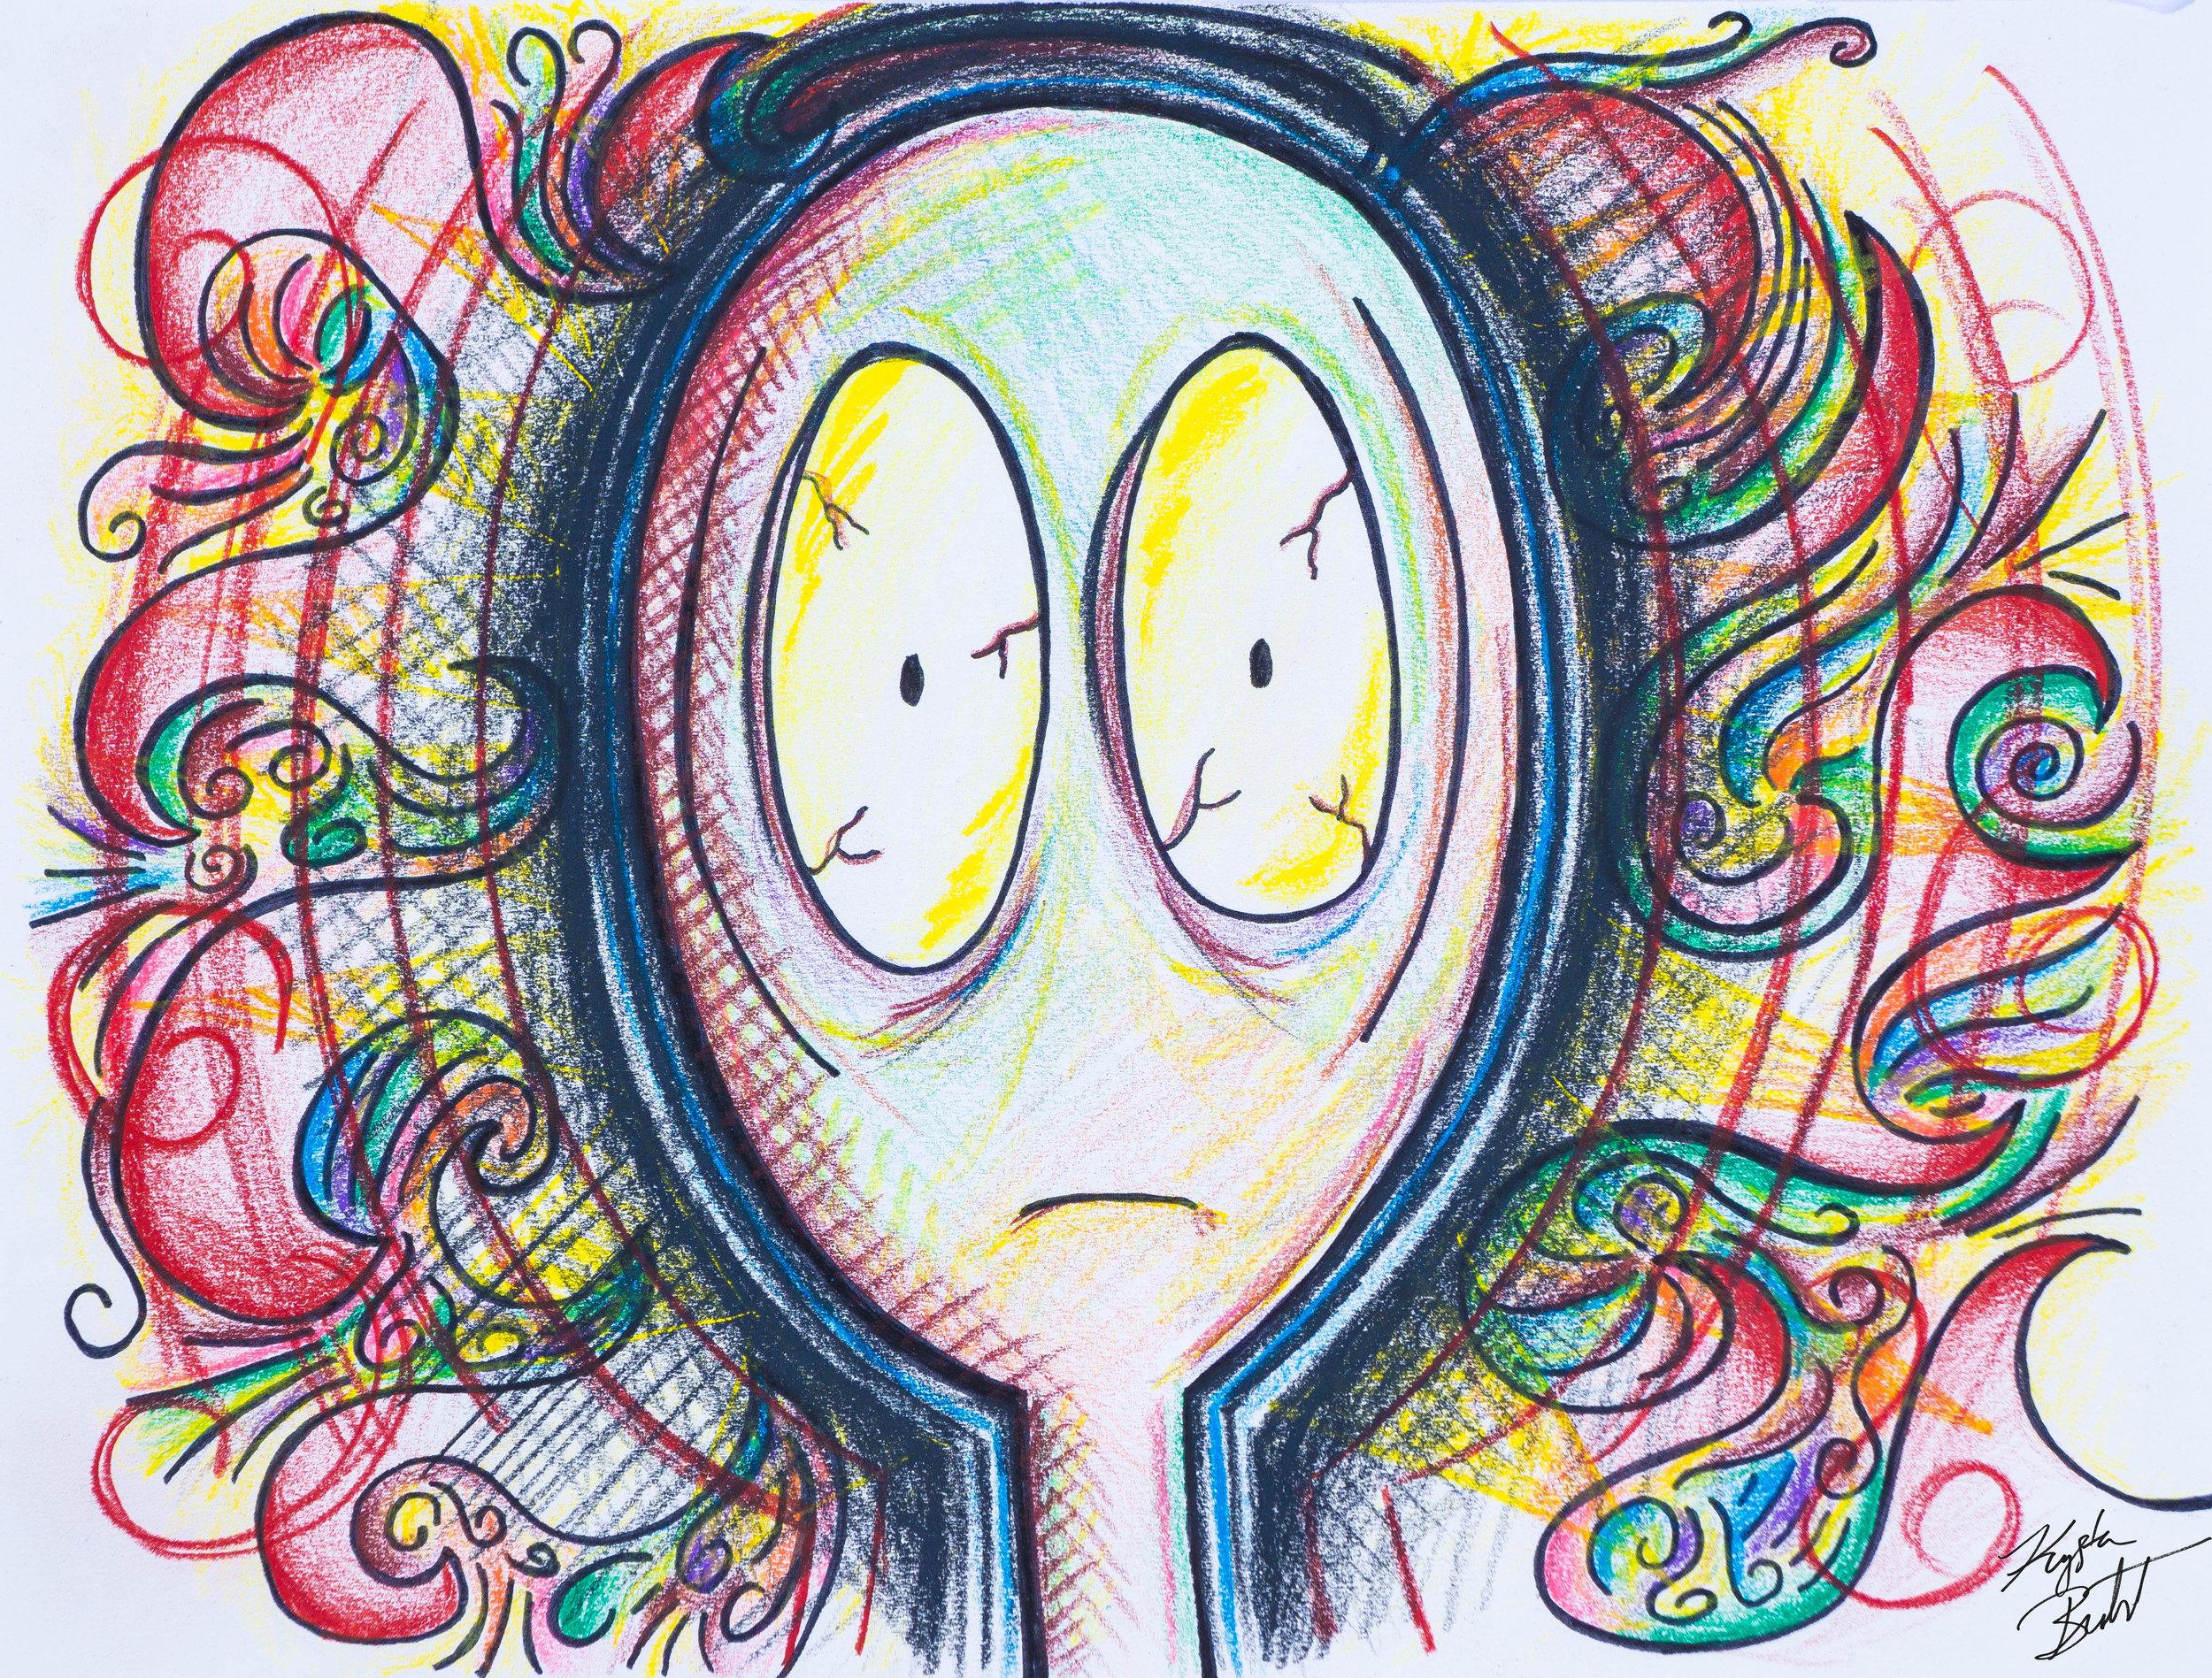 """#freakingout"" by Krysta Bernhardt (emoji, pencil drawing, colored pencil, ink)"